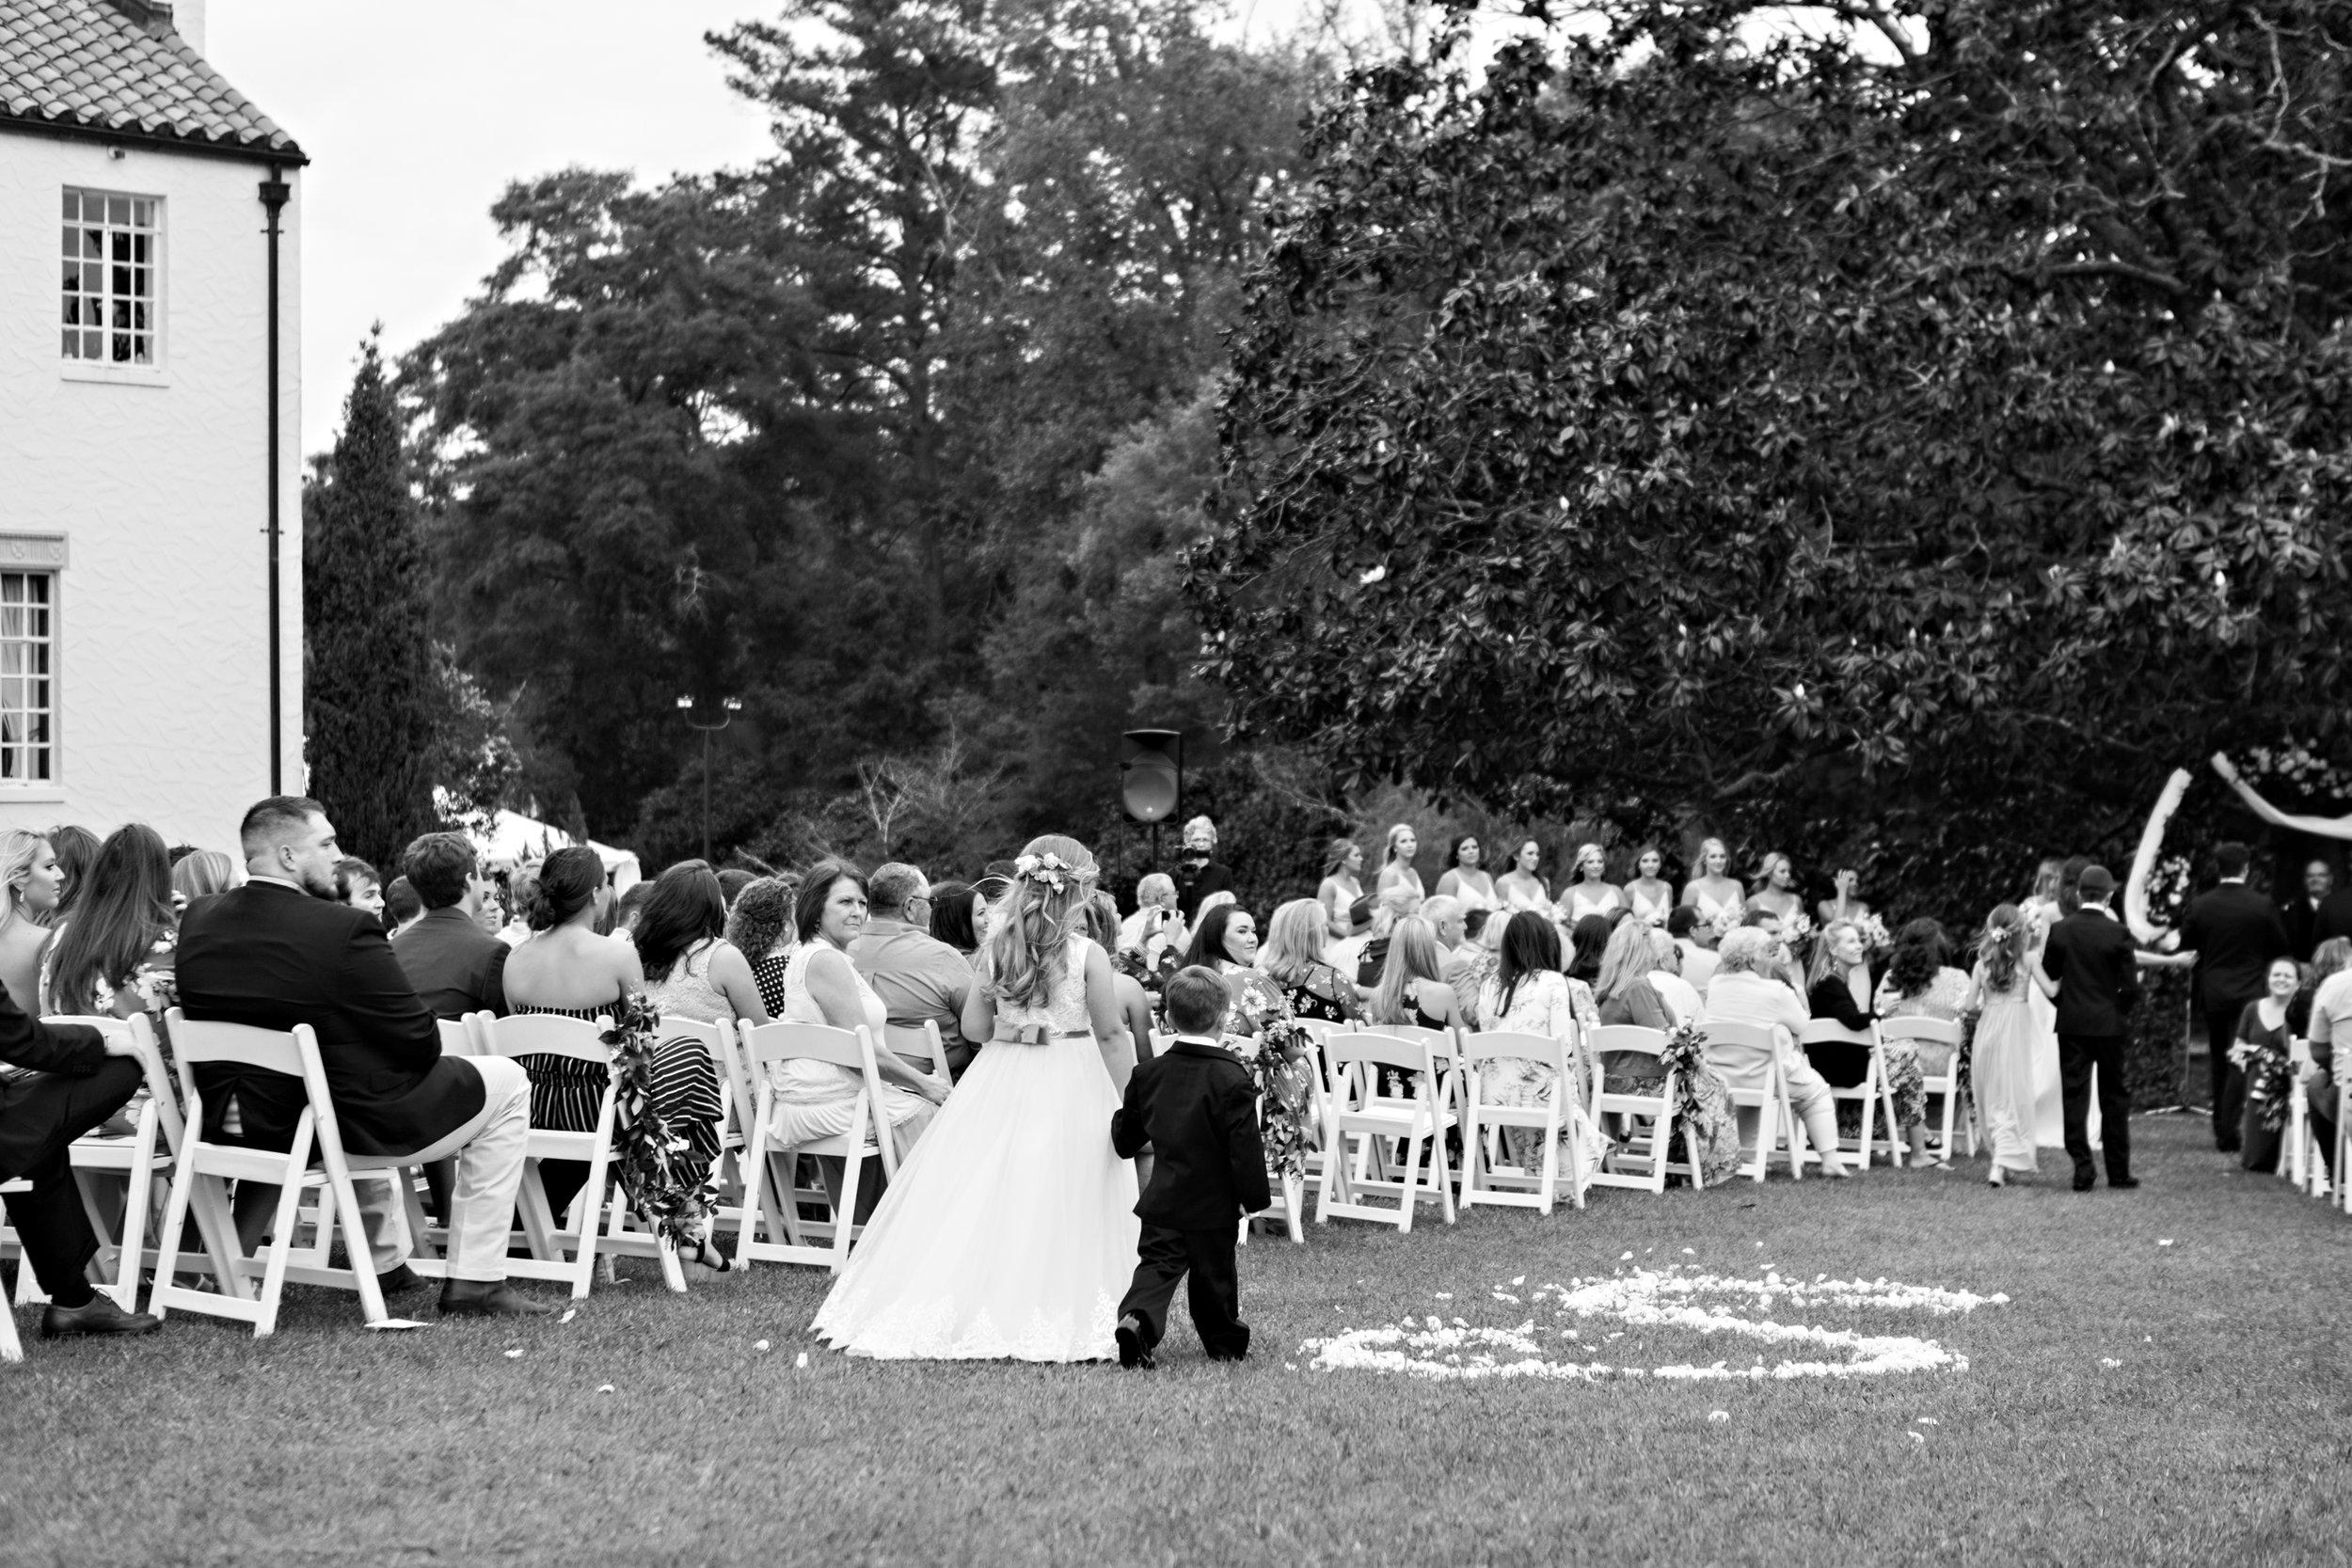 Matty-Drollette-Montgomery-Alabama-Wedding-Photography-144.jpg